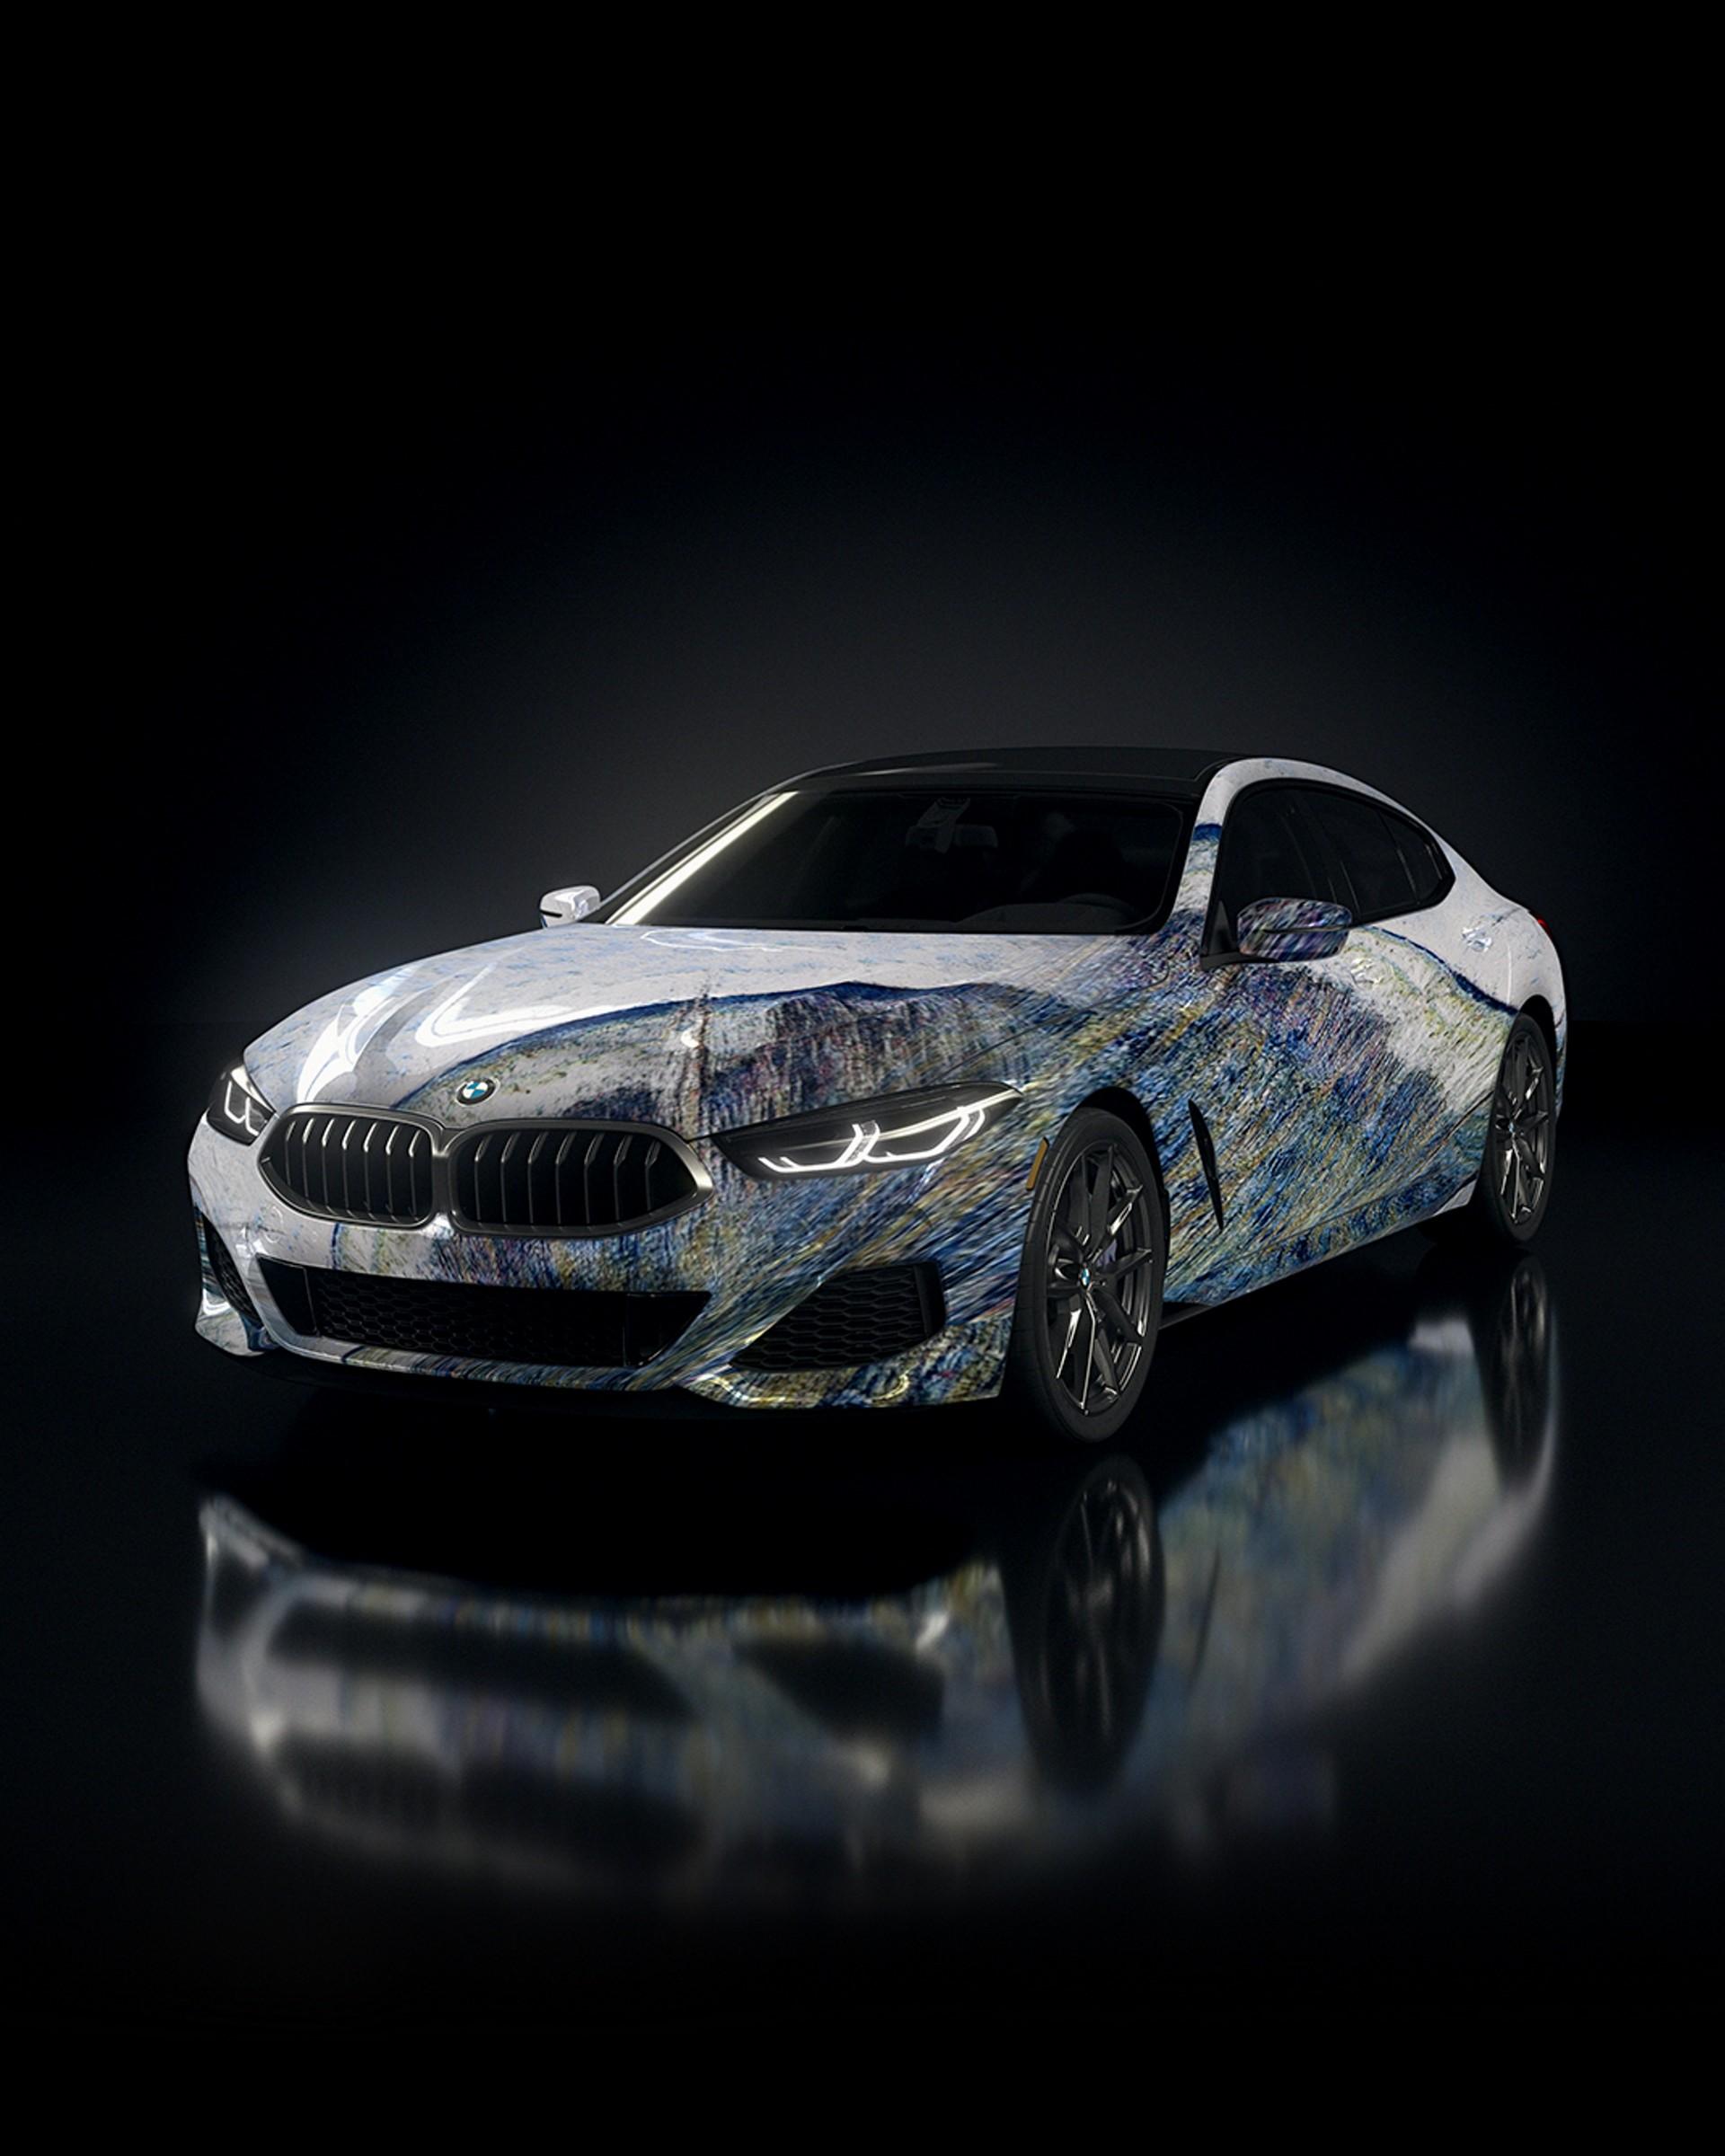 BMW-8-Series-Gran-Coupe-art-car-11